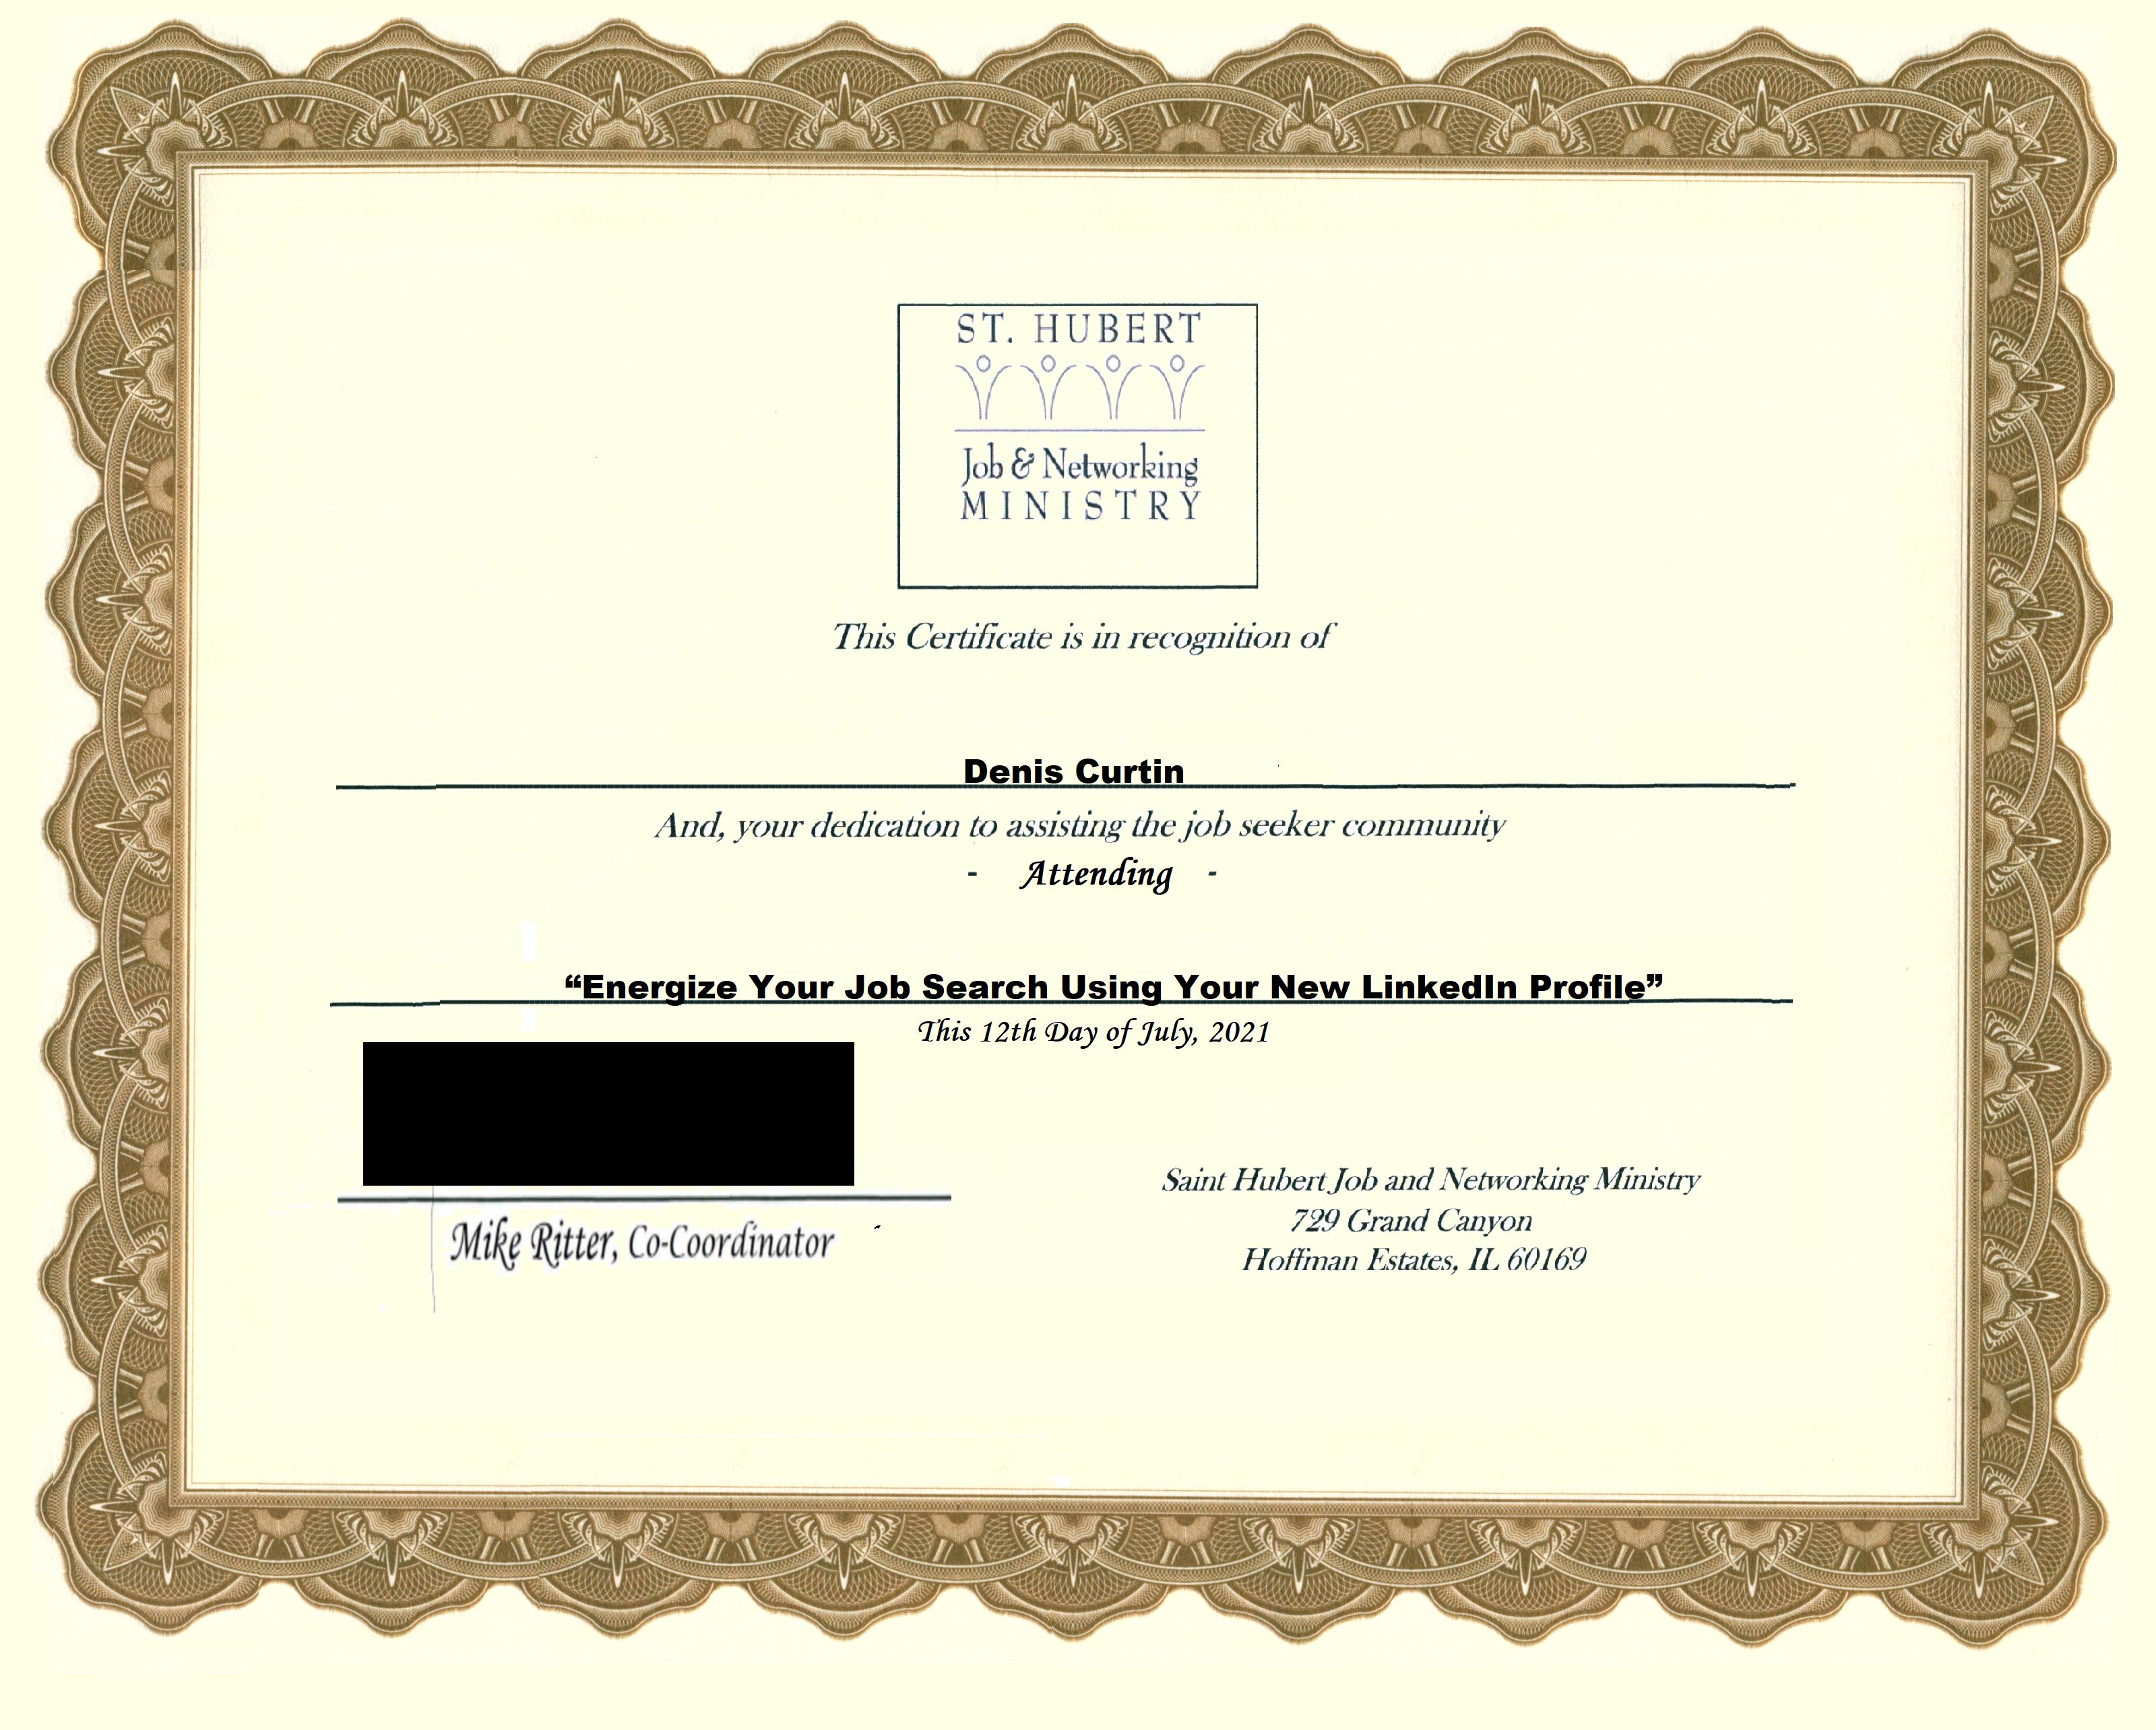 Denis Curtin 7.12.21 certificate (website version)